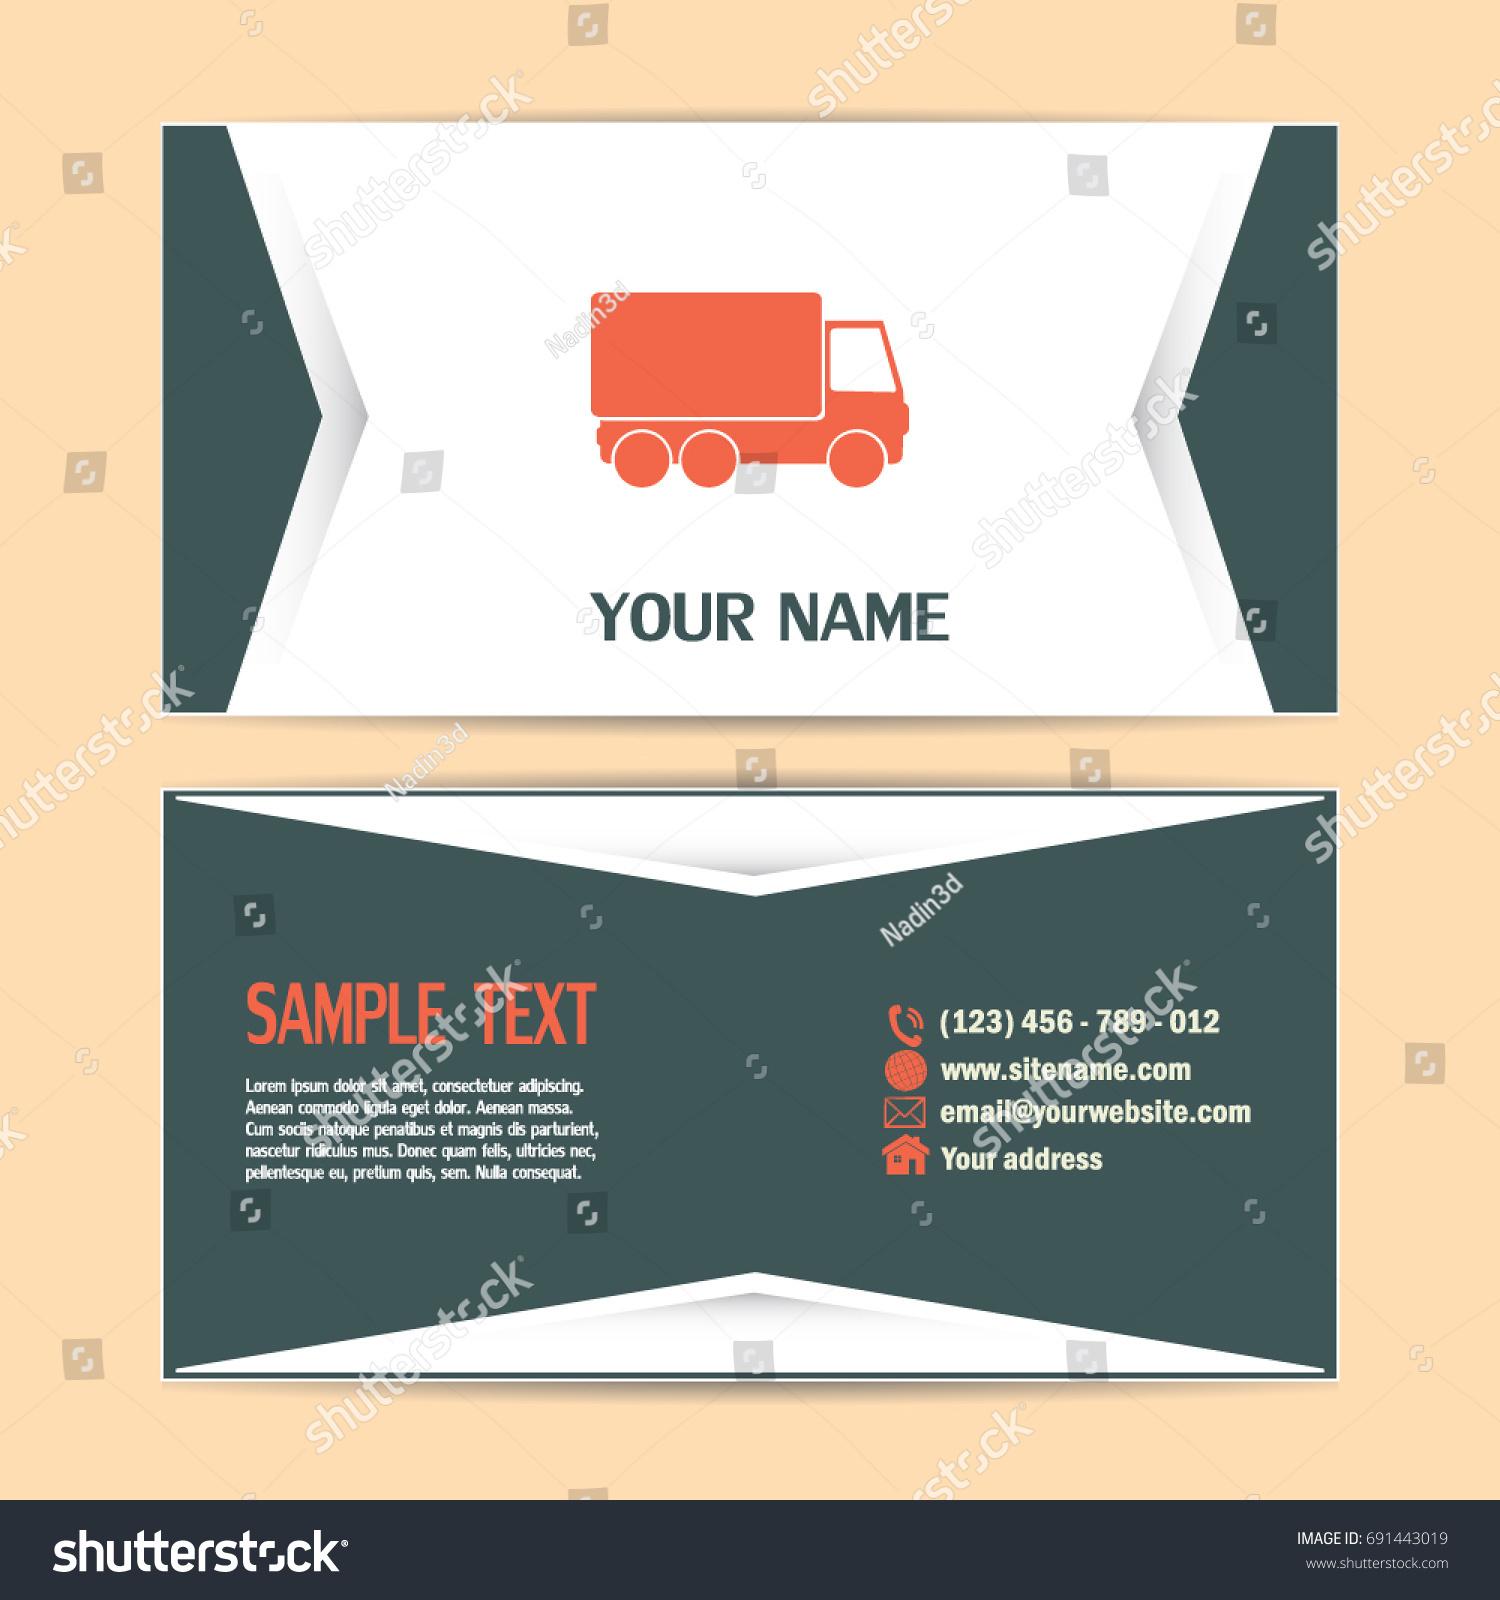 Business Cards Design Vector Illustration Truck Stock Vector ...